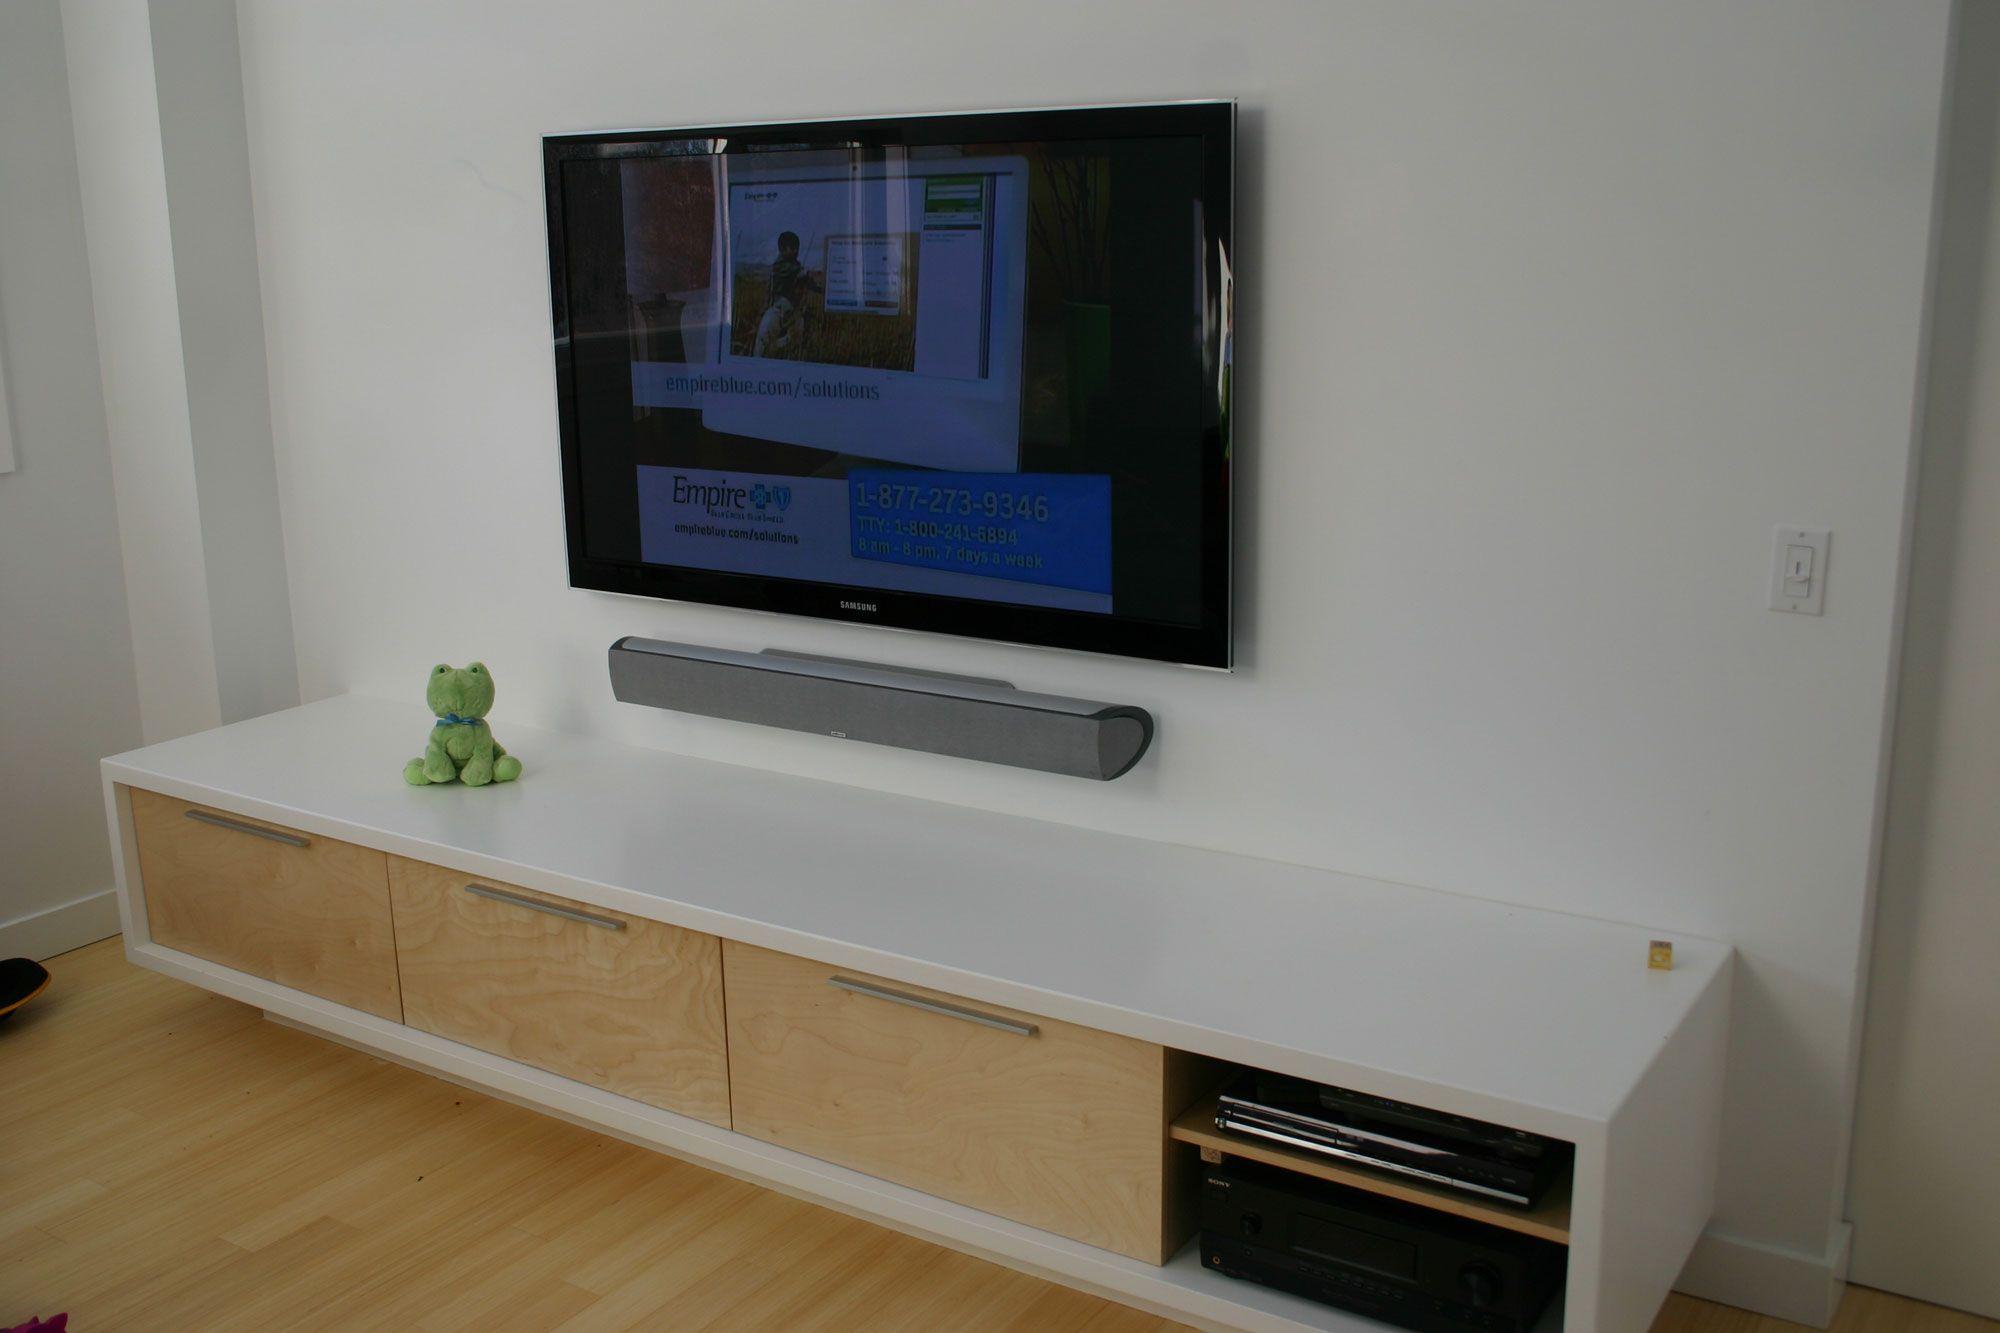 Charming Tv Shelves Design Flat Tv Mounting Ideas Flat Tv Mounting ...